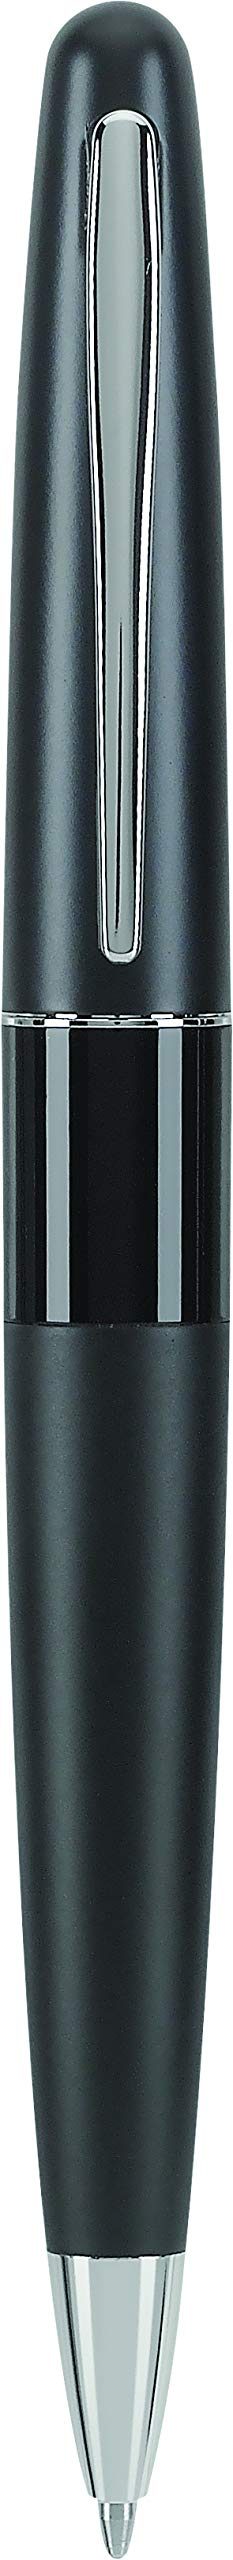 PILOT Metropolitan Collection Ball Point Pen, Black Barrel, Classic Design, Medium Point, Black Ink (91307)